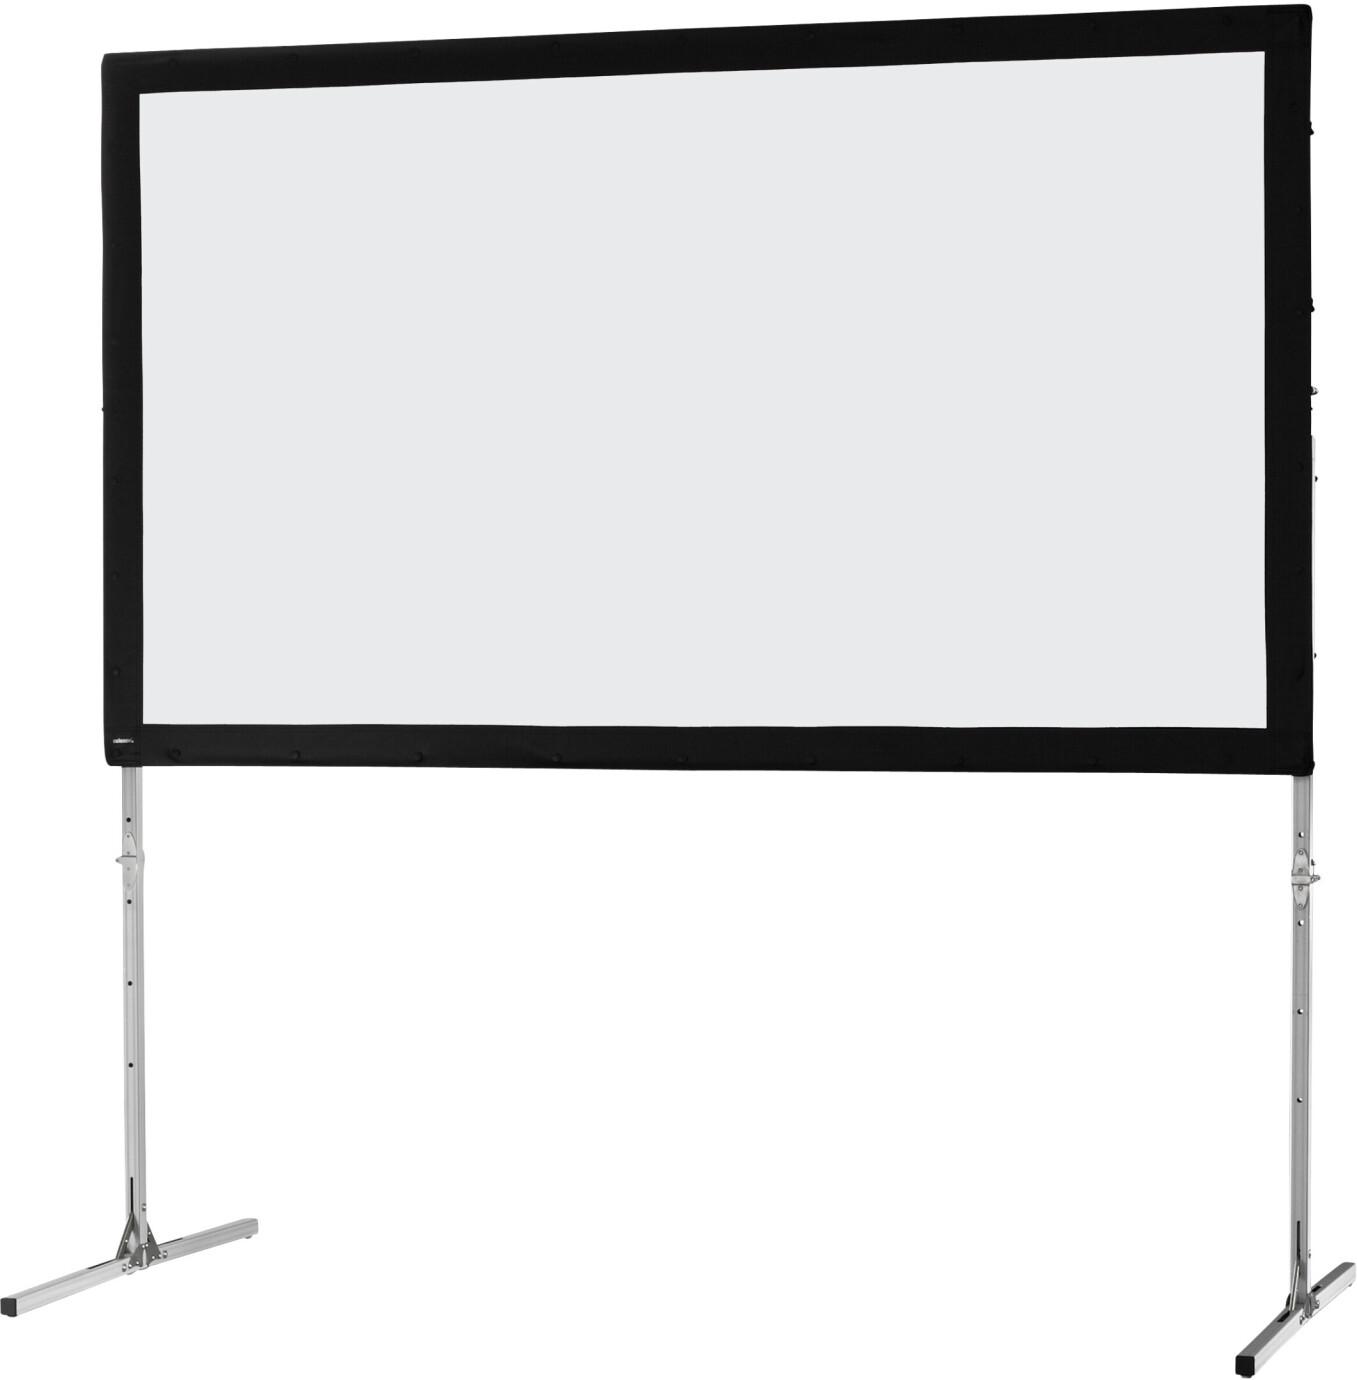 celexon Faltrahmen Leinwand Mobil Expert 406 x 228cm, Frontprojektion